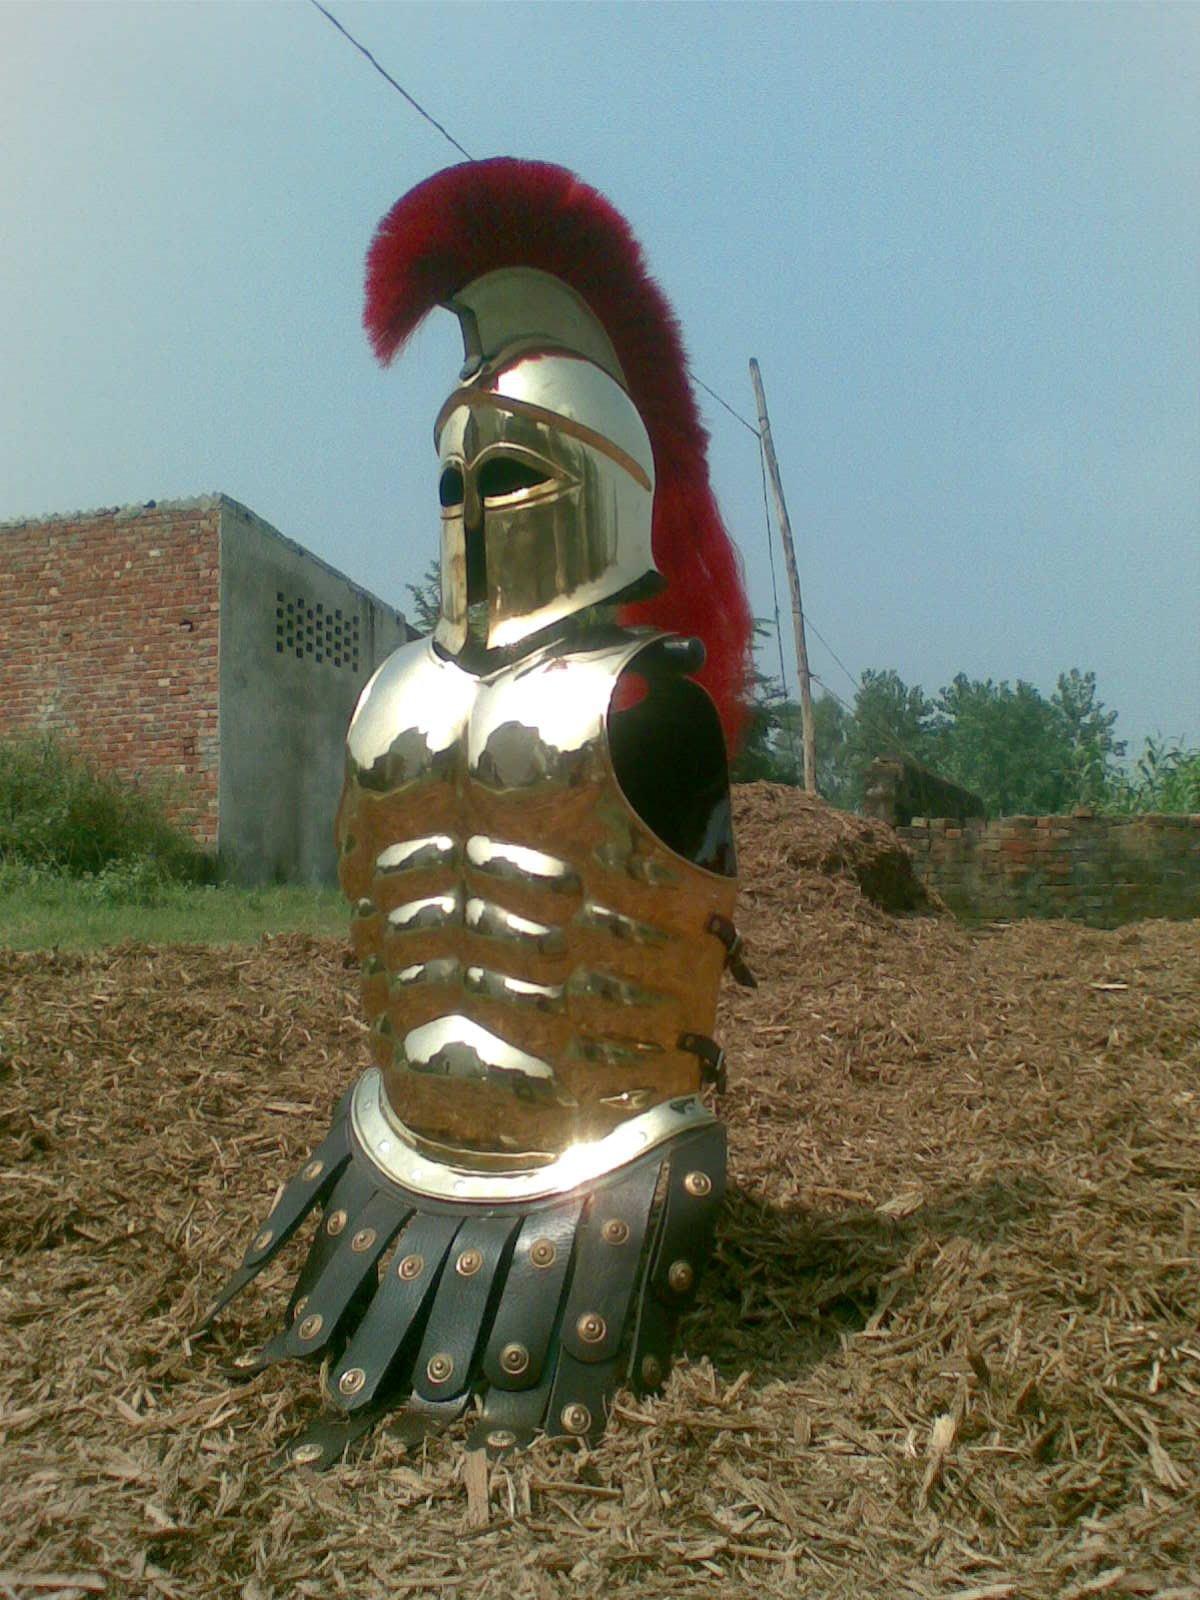 NAUTICALMART Armor Halloween Costume Wearable Muscle Armor with Corinthian Helmet